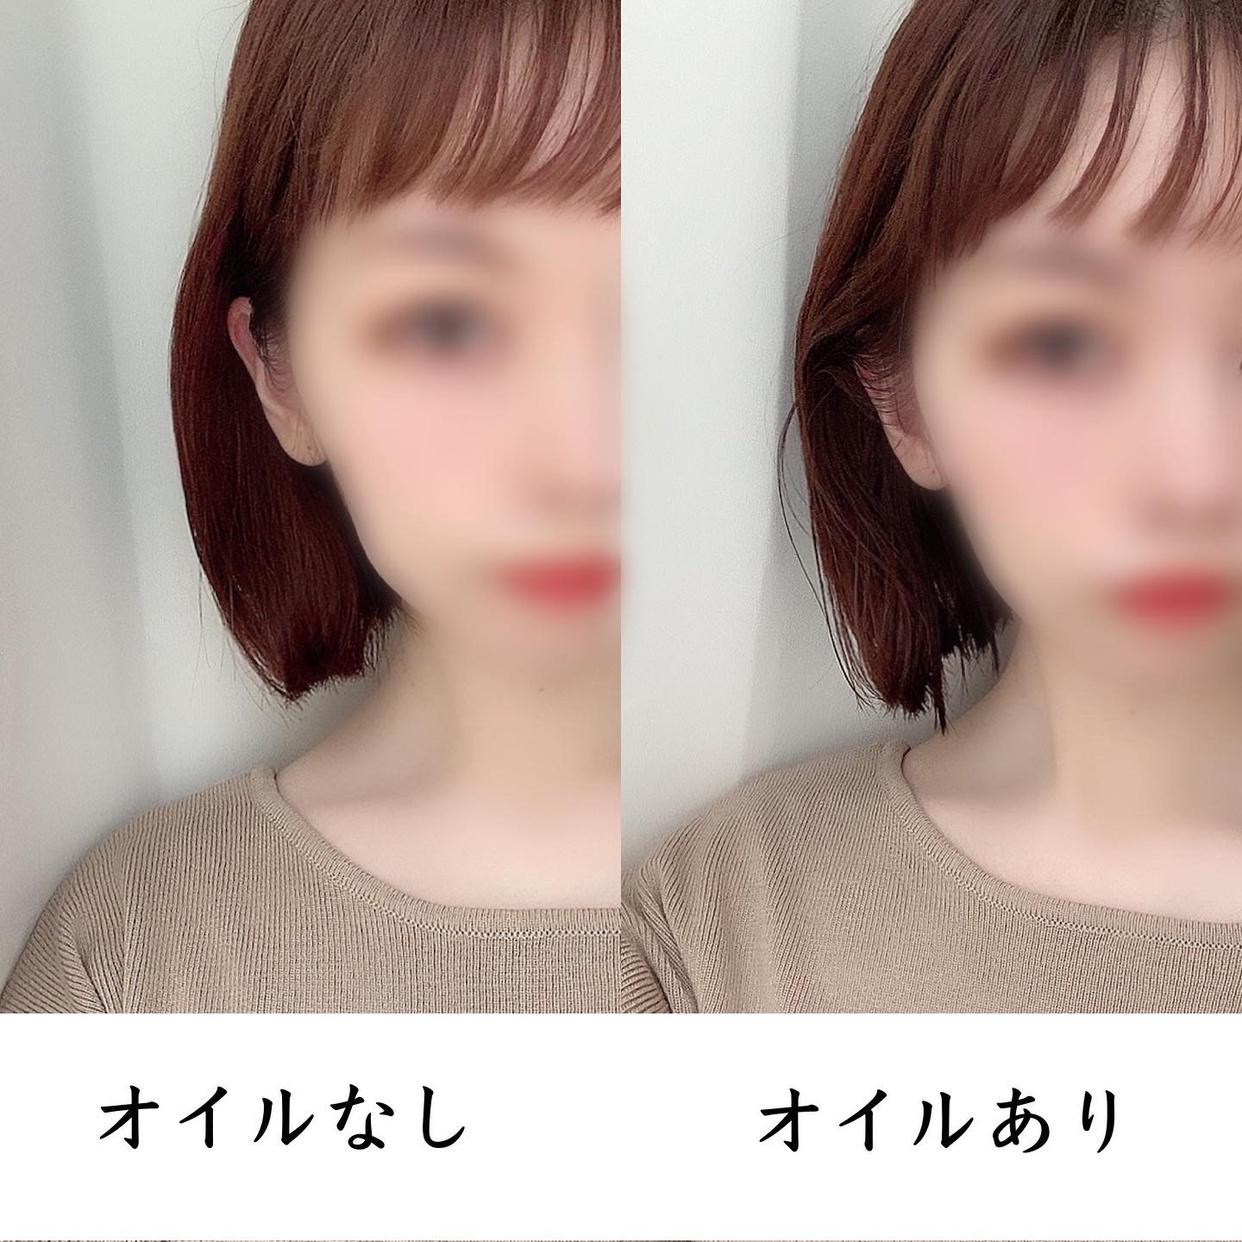 N.(エヌドット)ポリッシュオイルを使った只野ひとみさんのクチコミ画像3